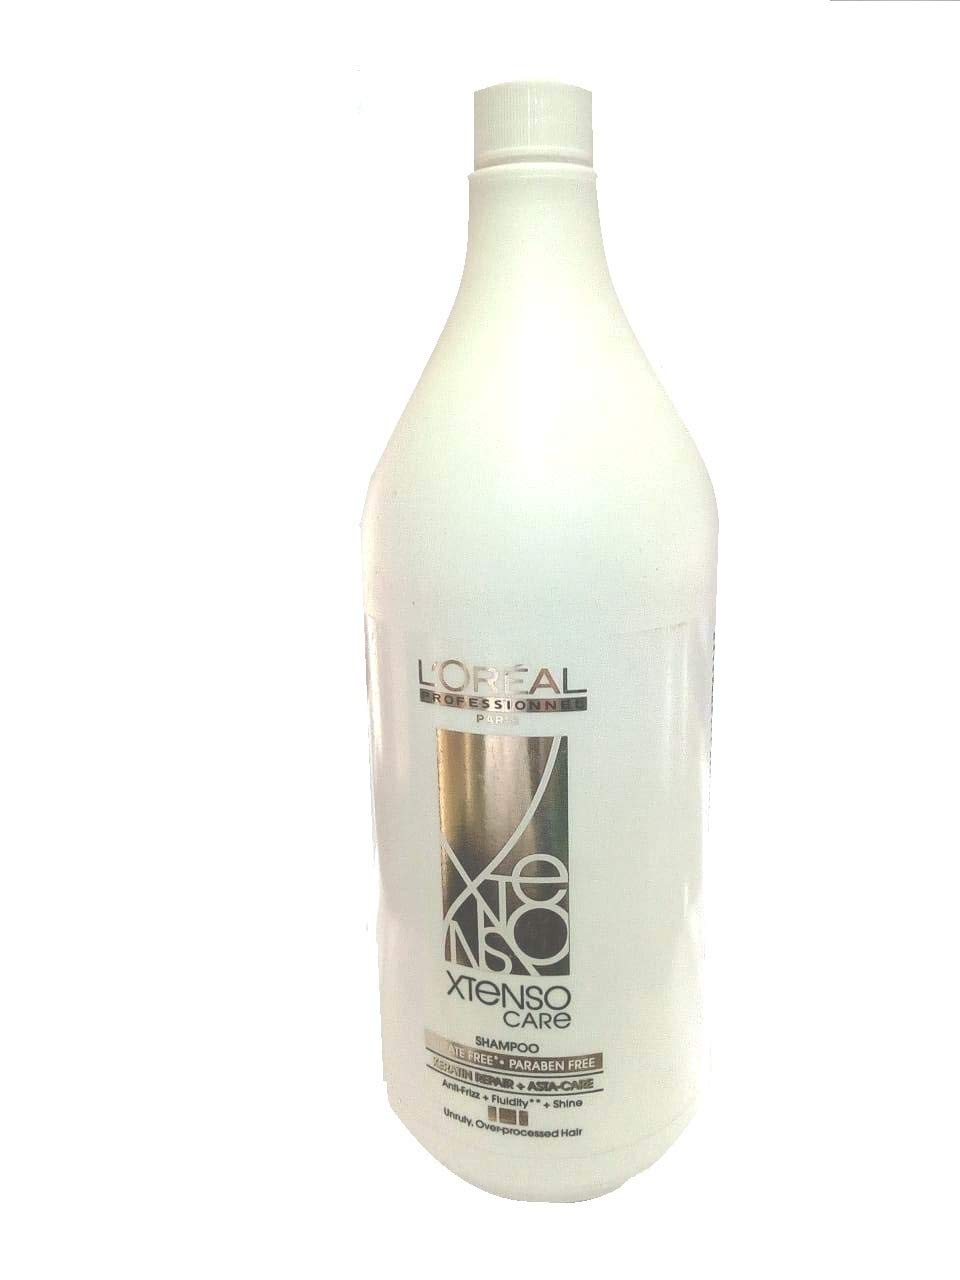 L Oreal Paris Xtenso Care Sulfate Free Shampoo 1 5 L Walmart Com Walmart Com